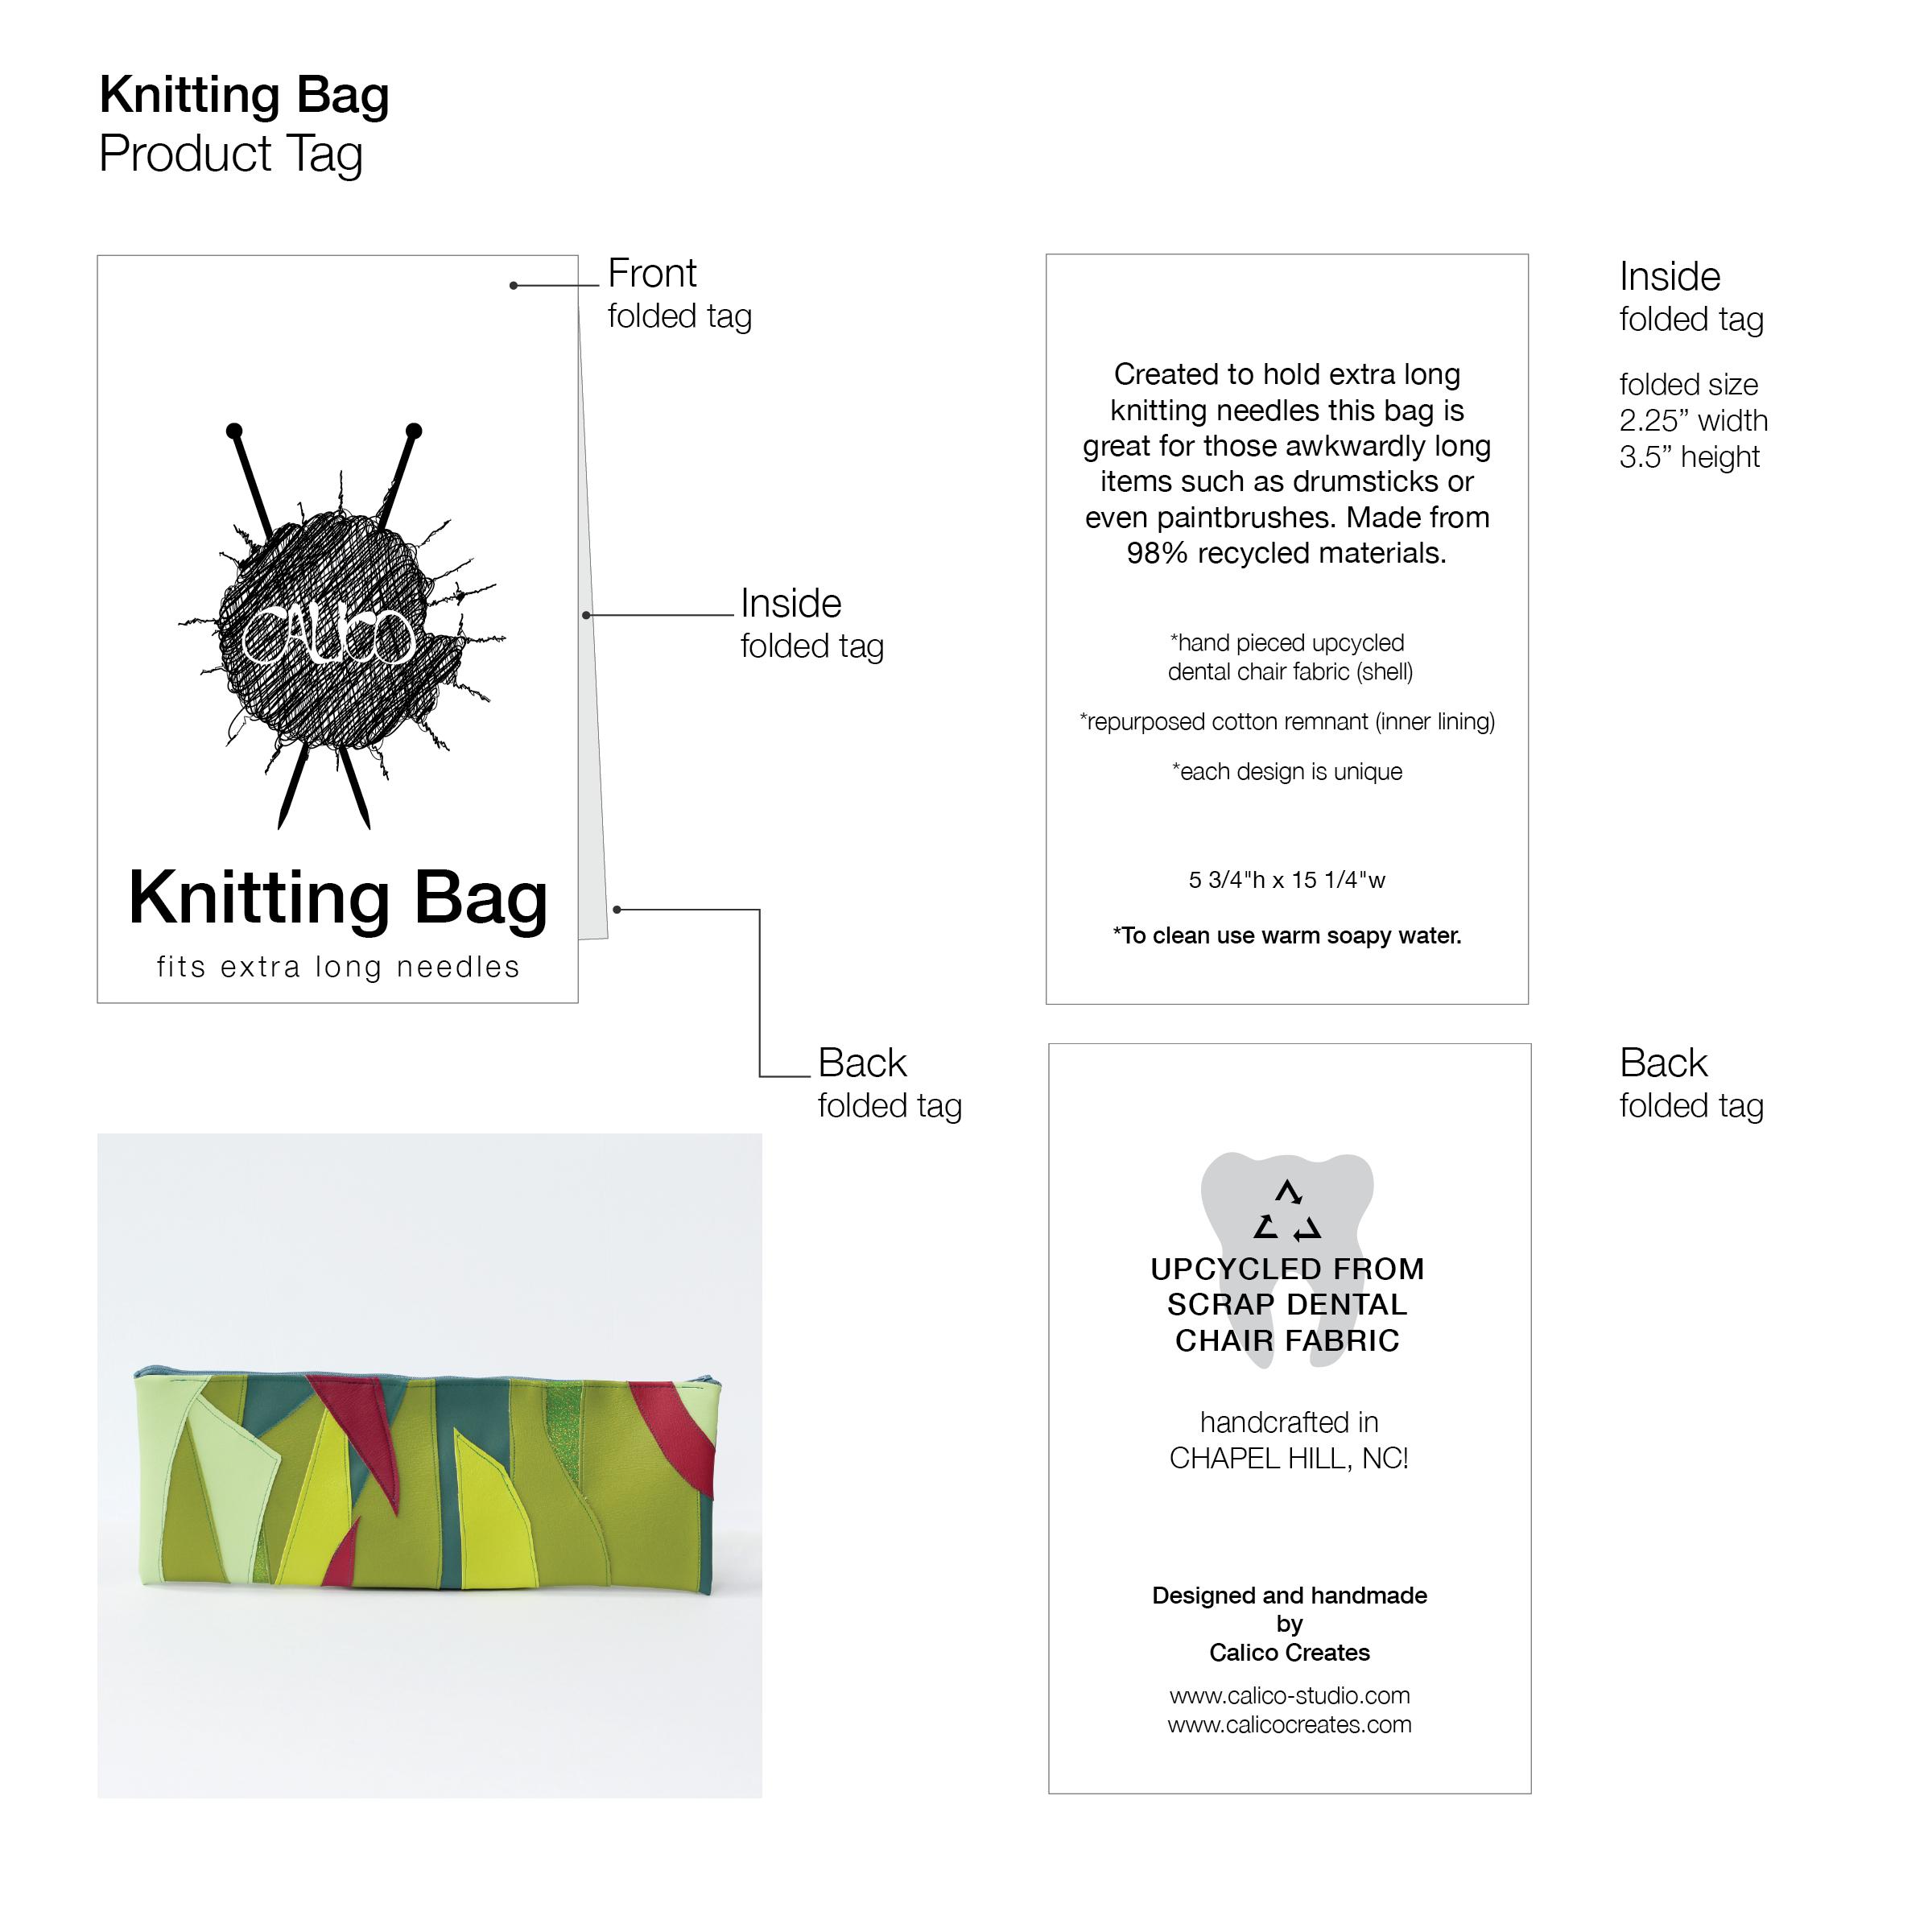 KnittingBagProductTagGraphics.png